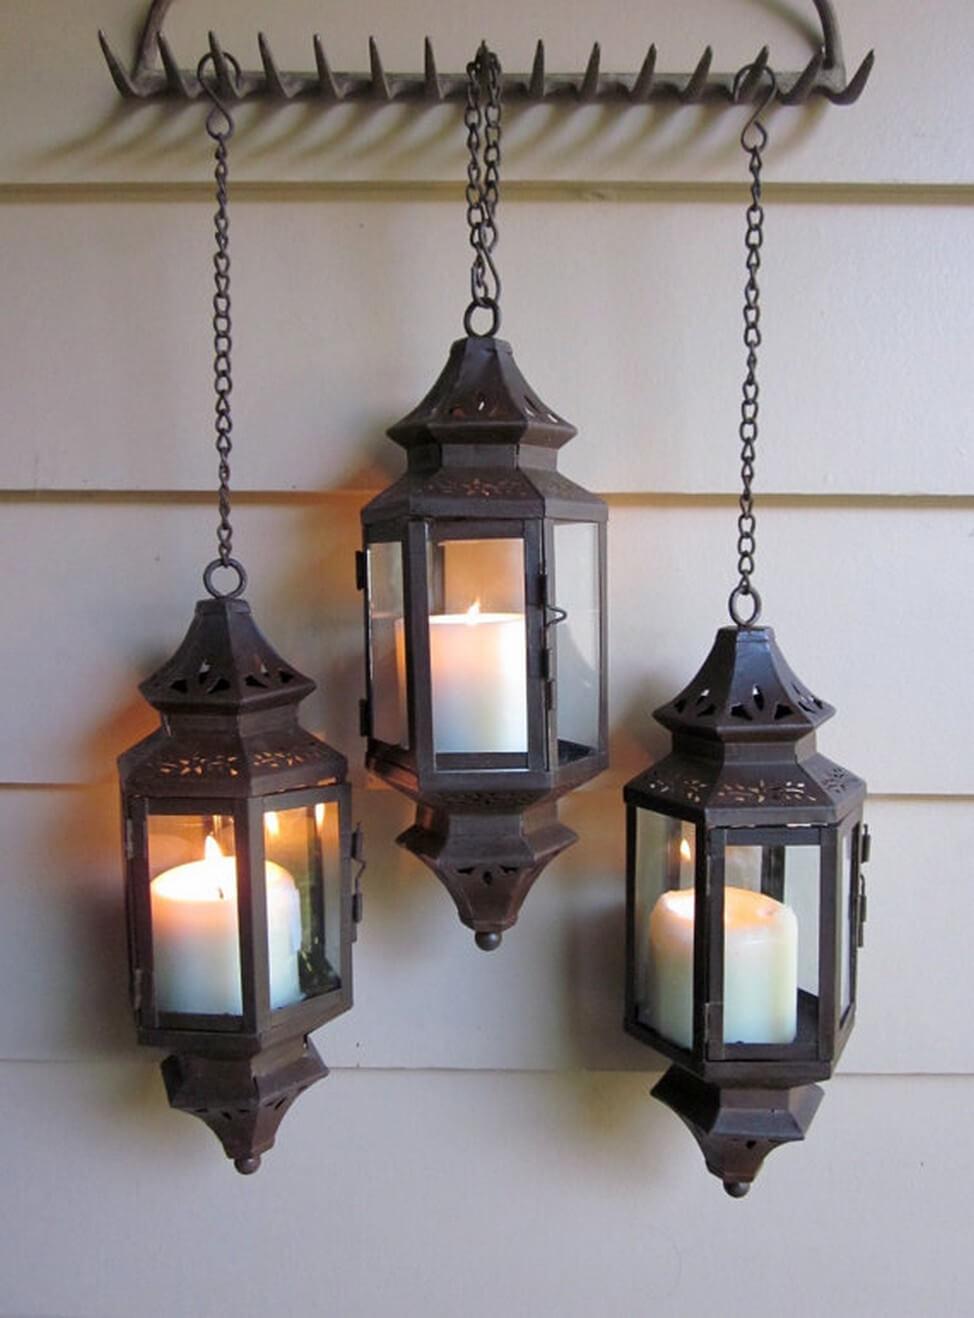 Three Pierced Lanterns on a Rake Hanger